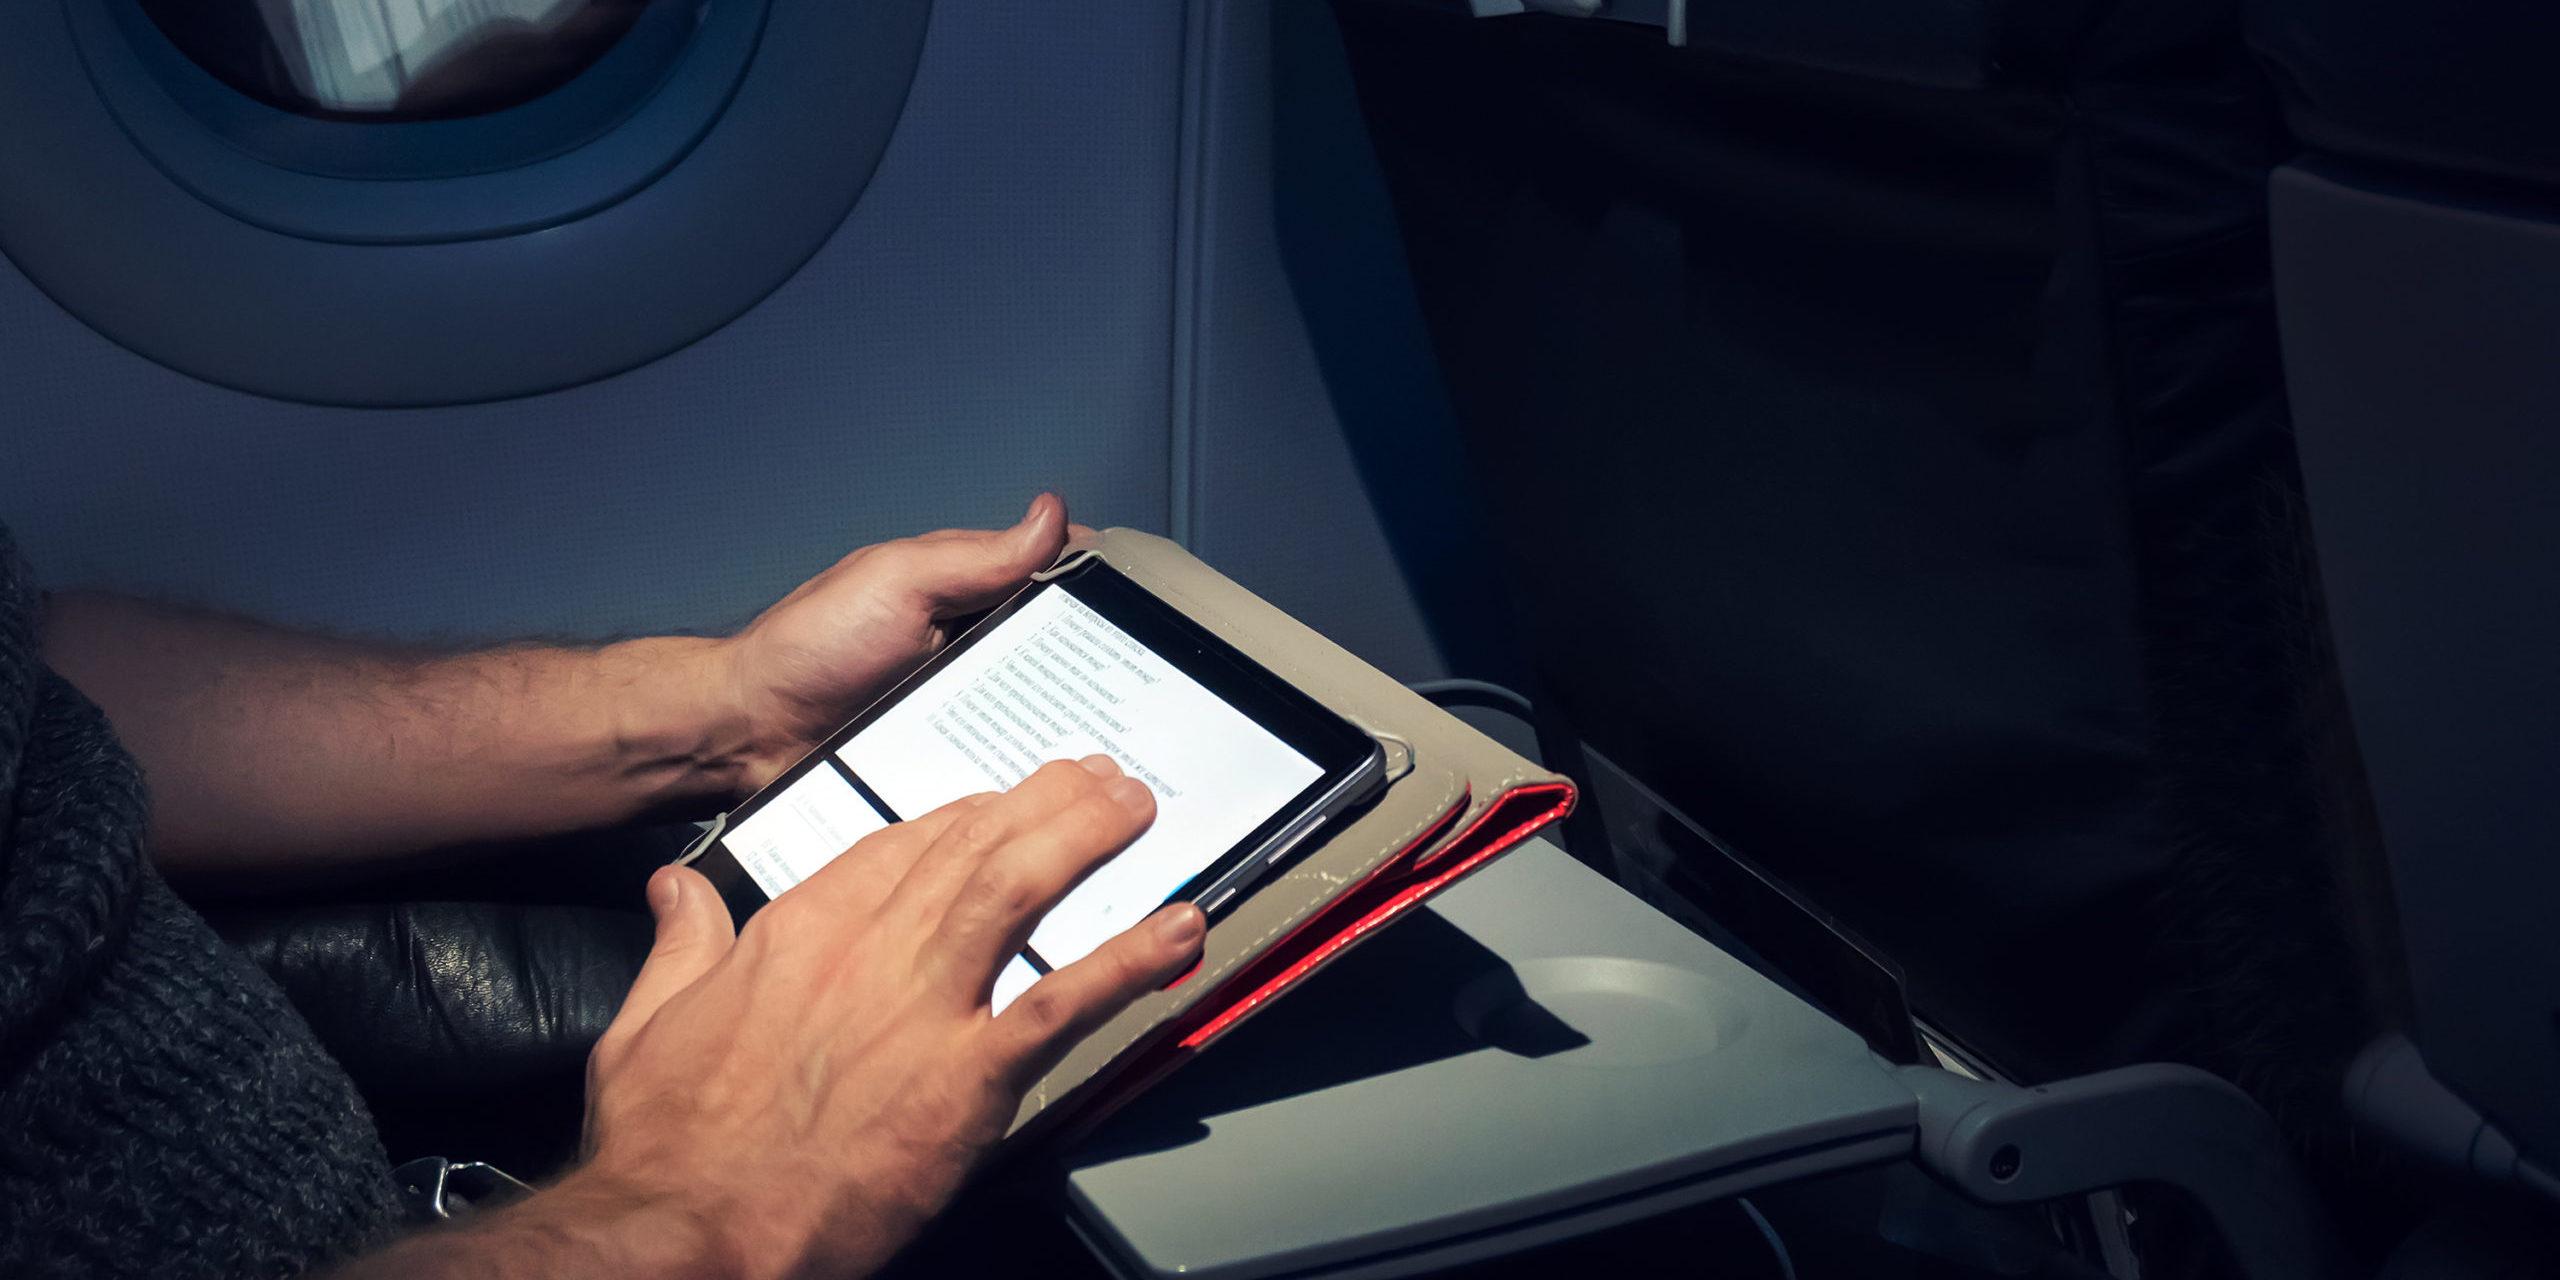 Tablet on plane